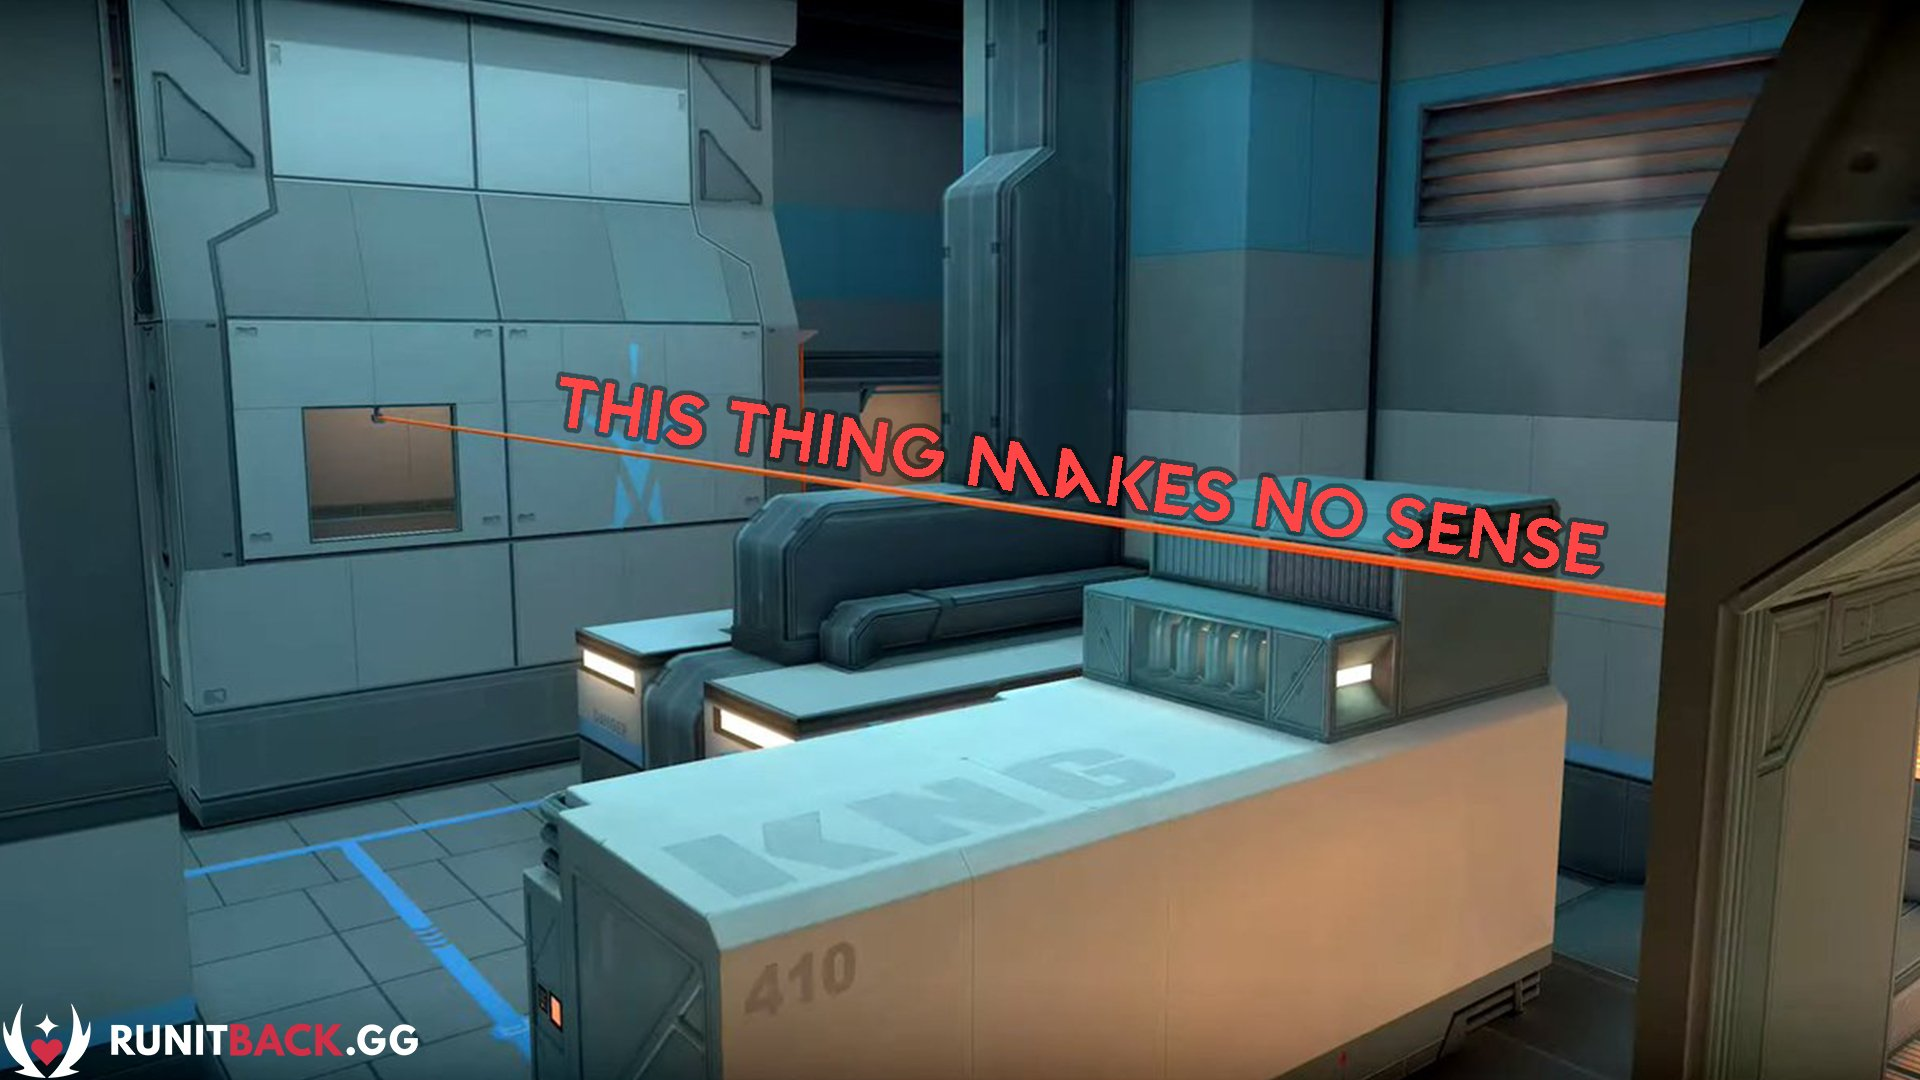 Valorant's Icebox zipline makes no sense